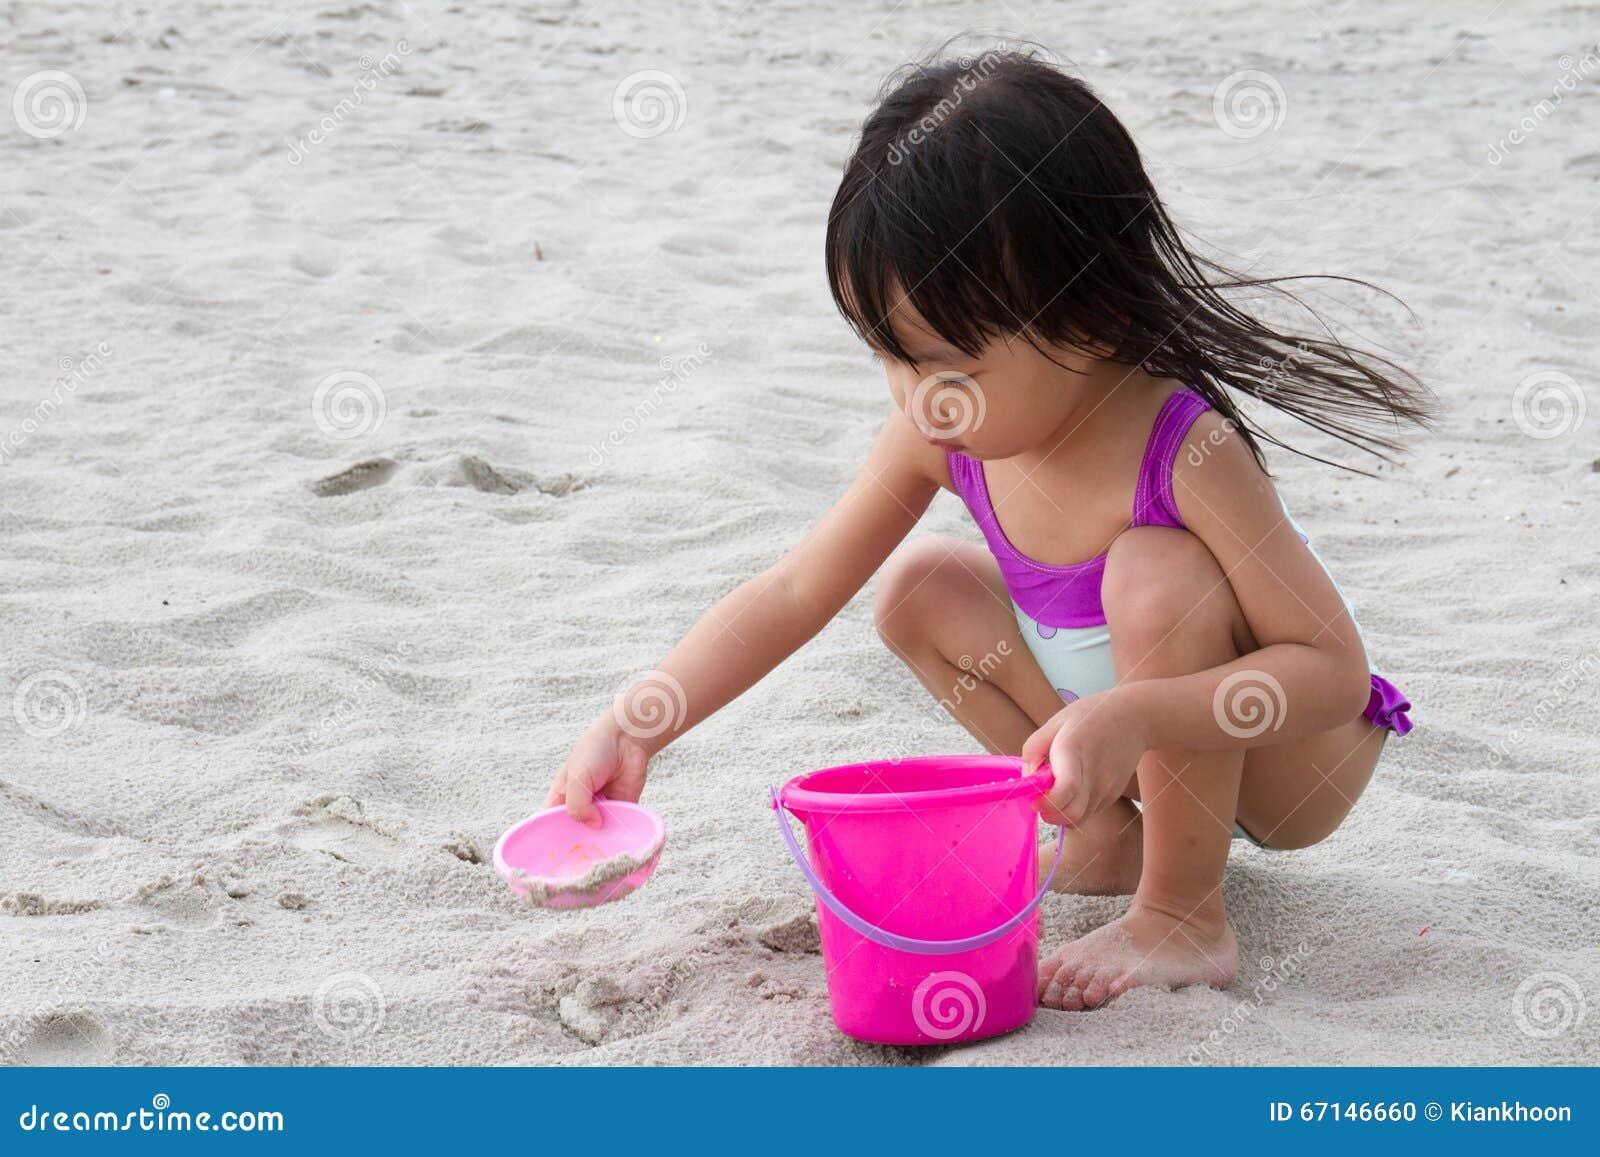 Asian Sand 7